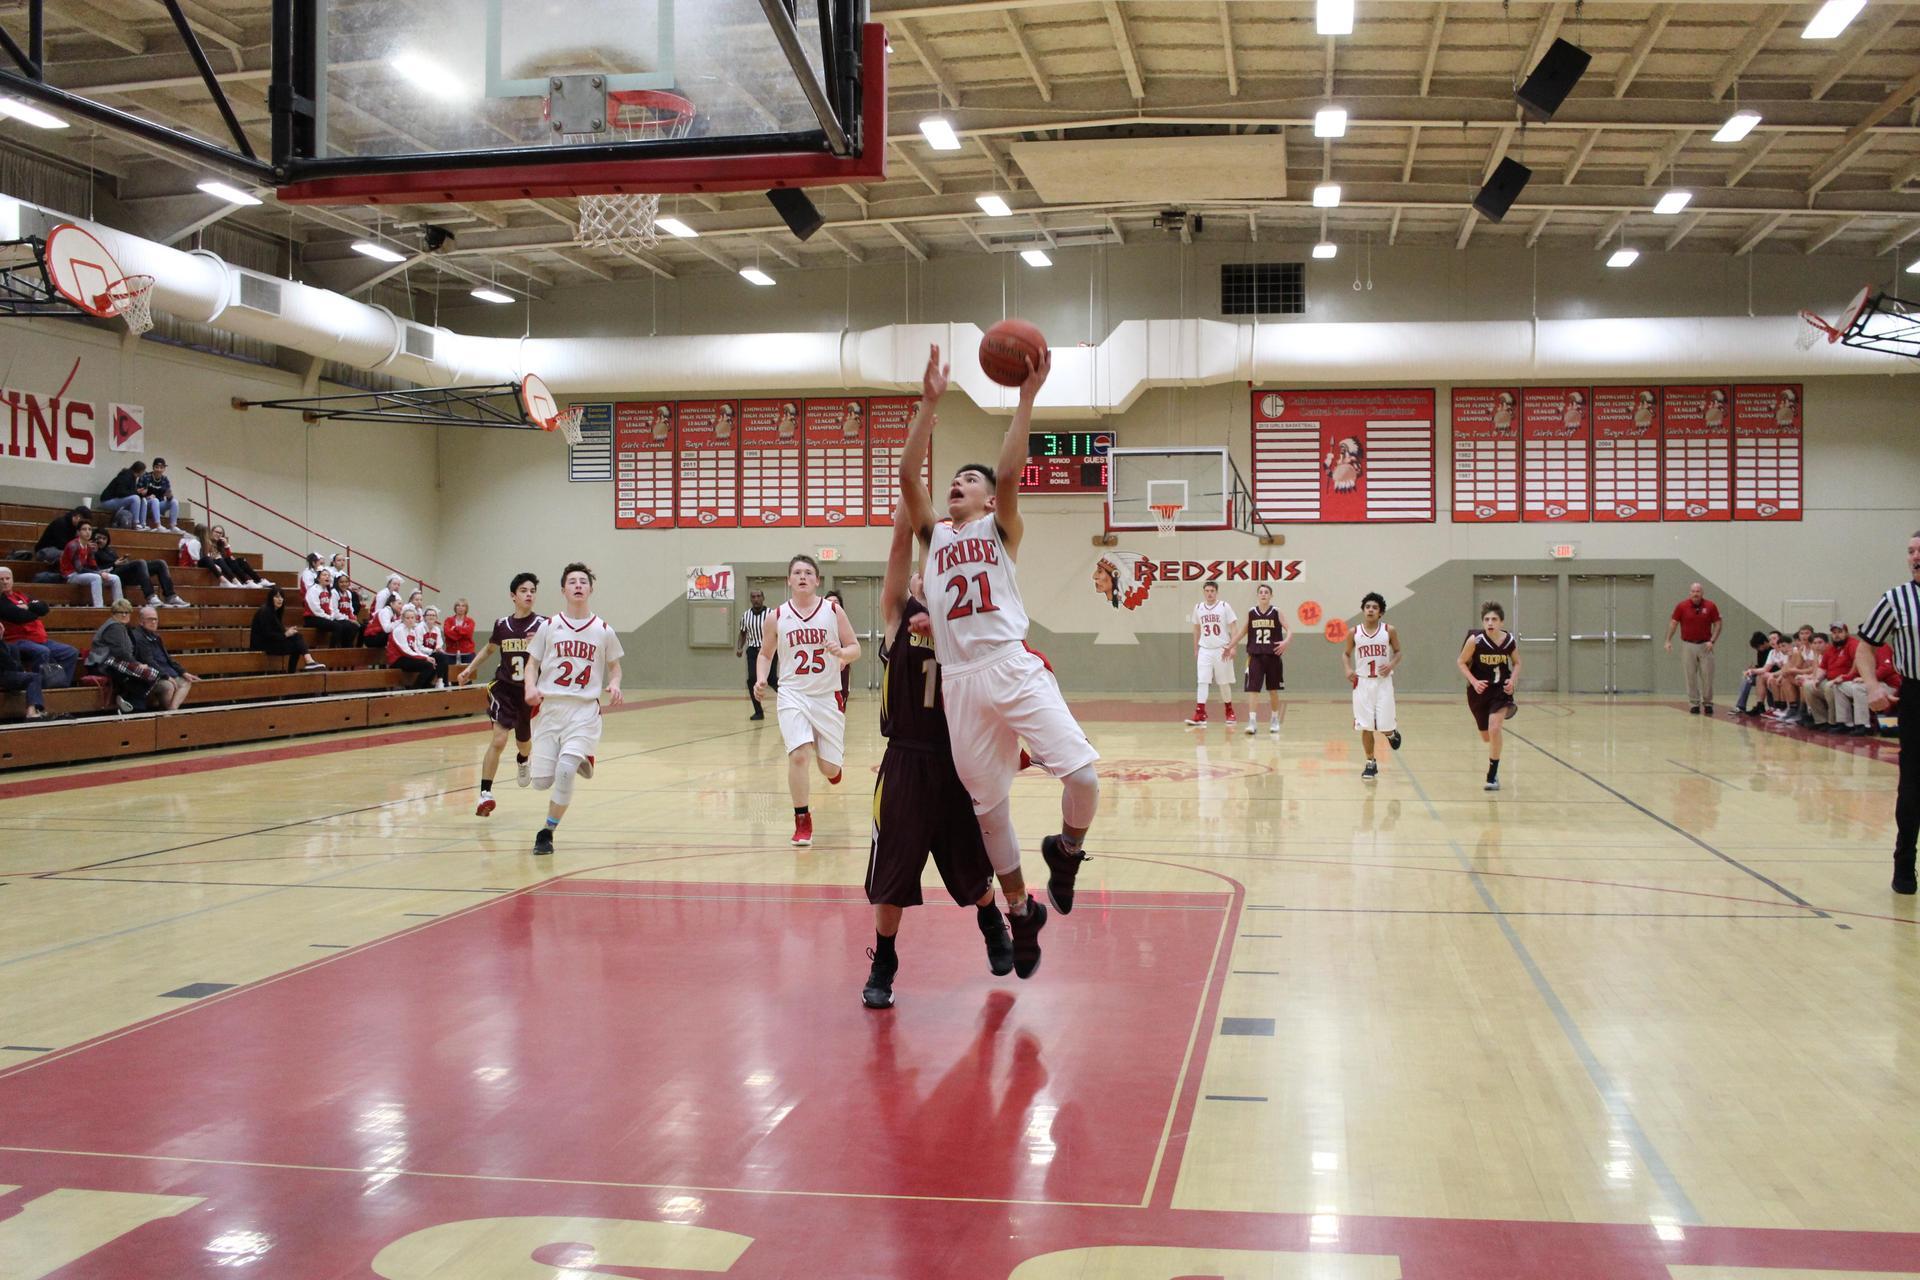 JV Boys playing basketball vs Sierra